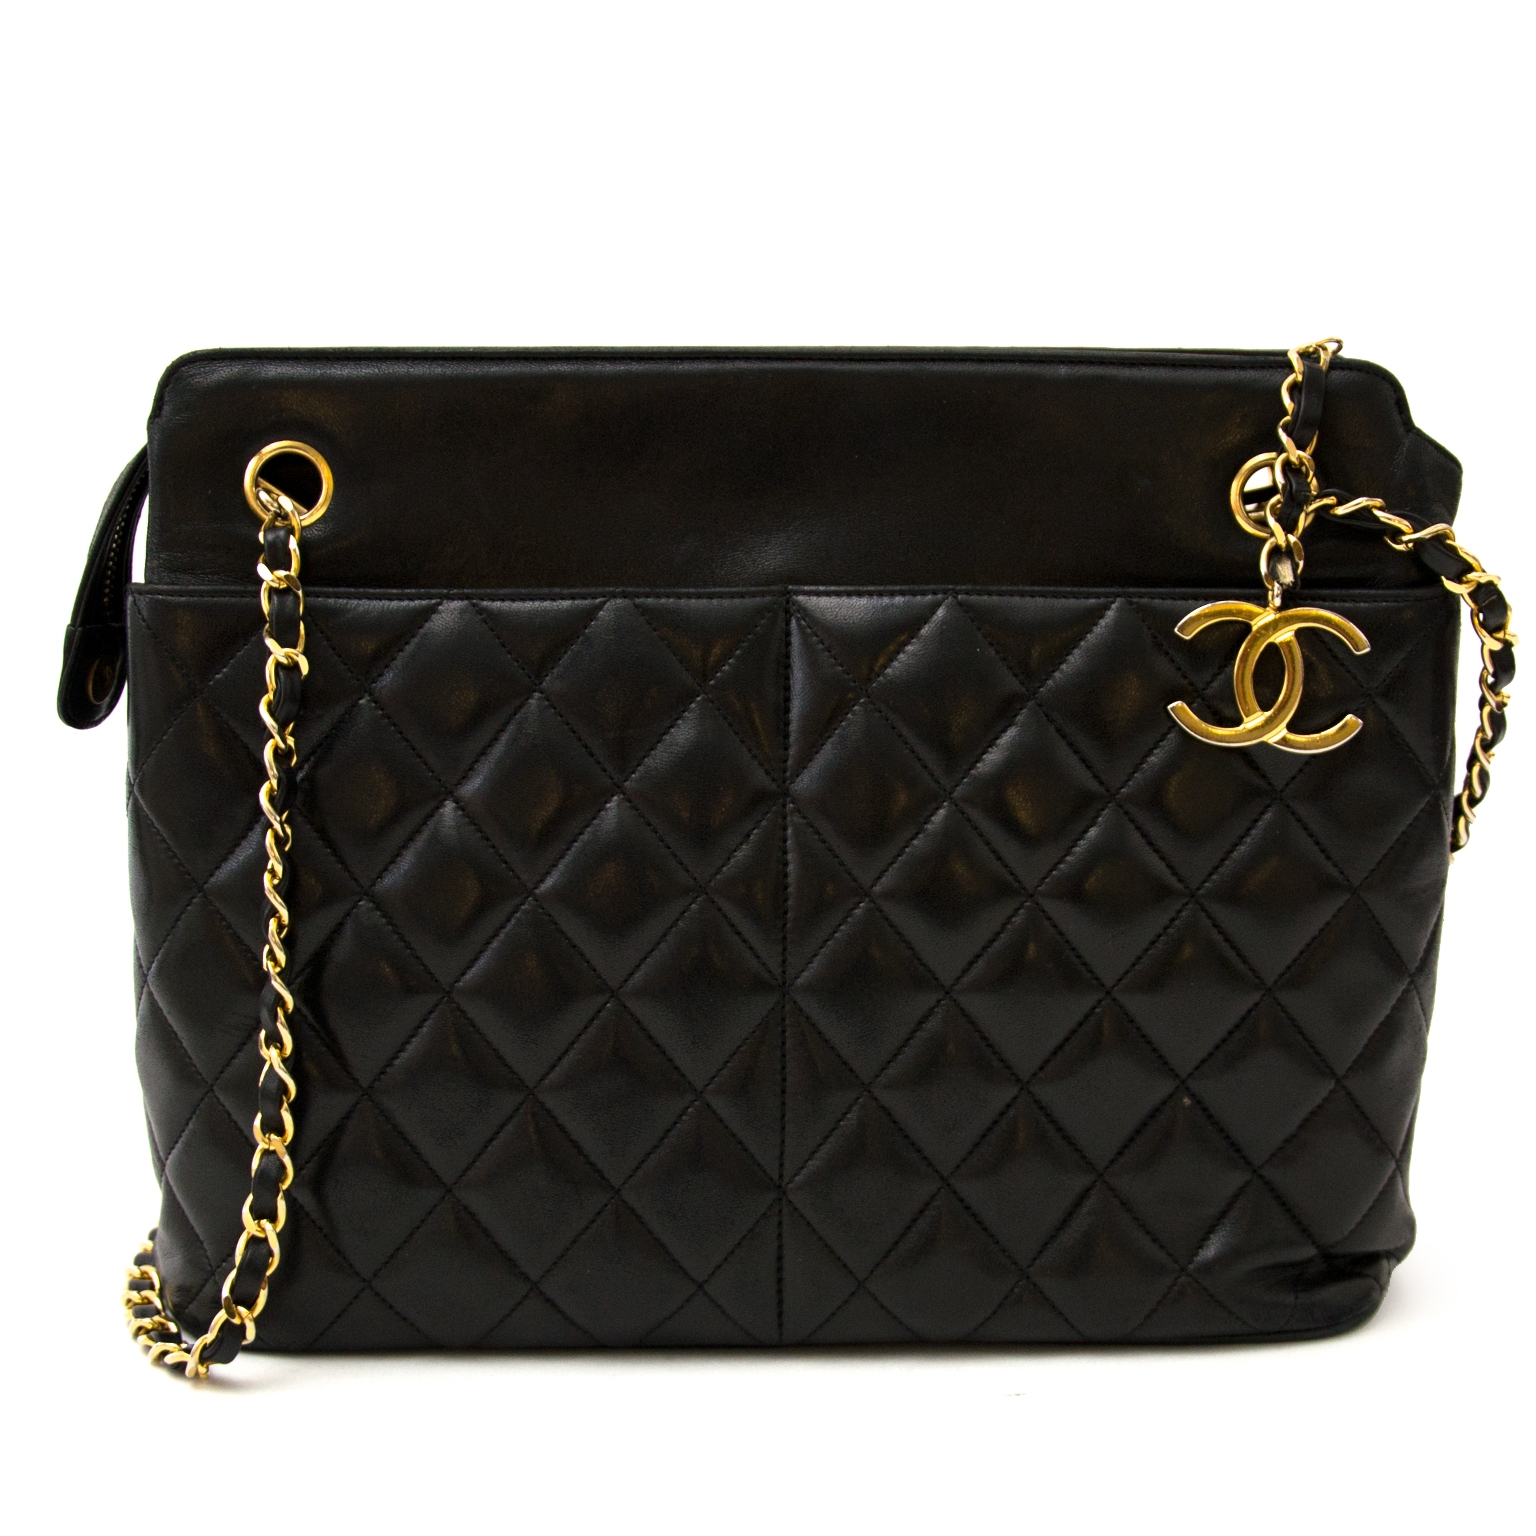 559e683606441 ... koop Chanel Black Vintage Lambskin Shopper bij labellov en betaal  veilig online